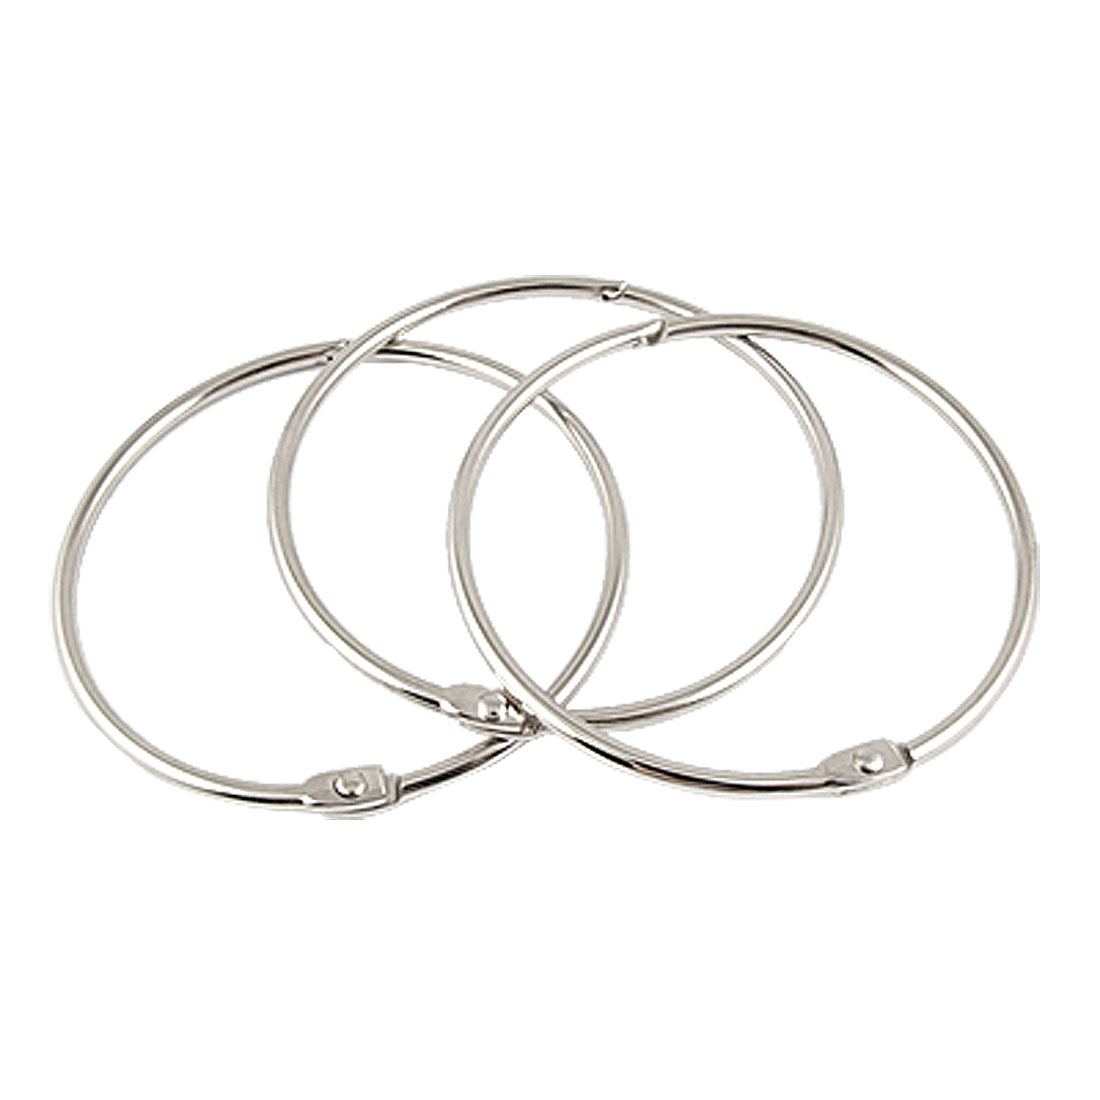 "3 Pcs 2.7"" Diameter Silver Tone Metal Split Style Bracelet Keyrings"